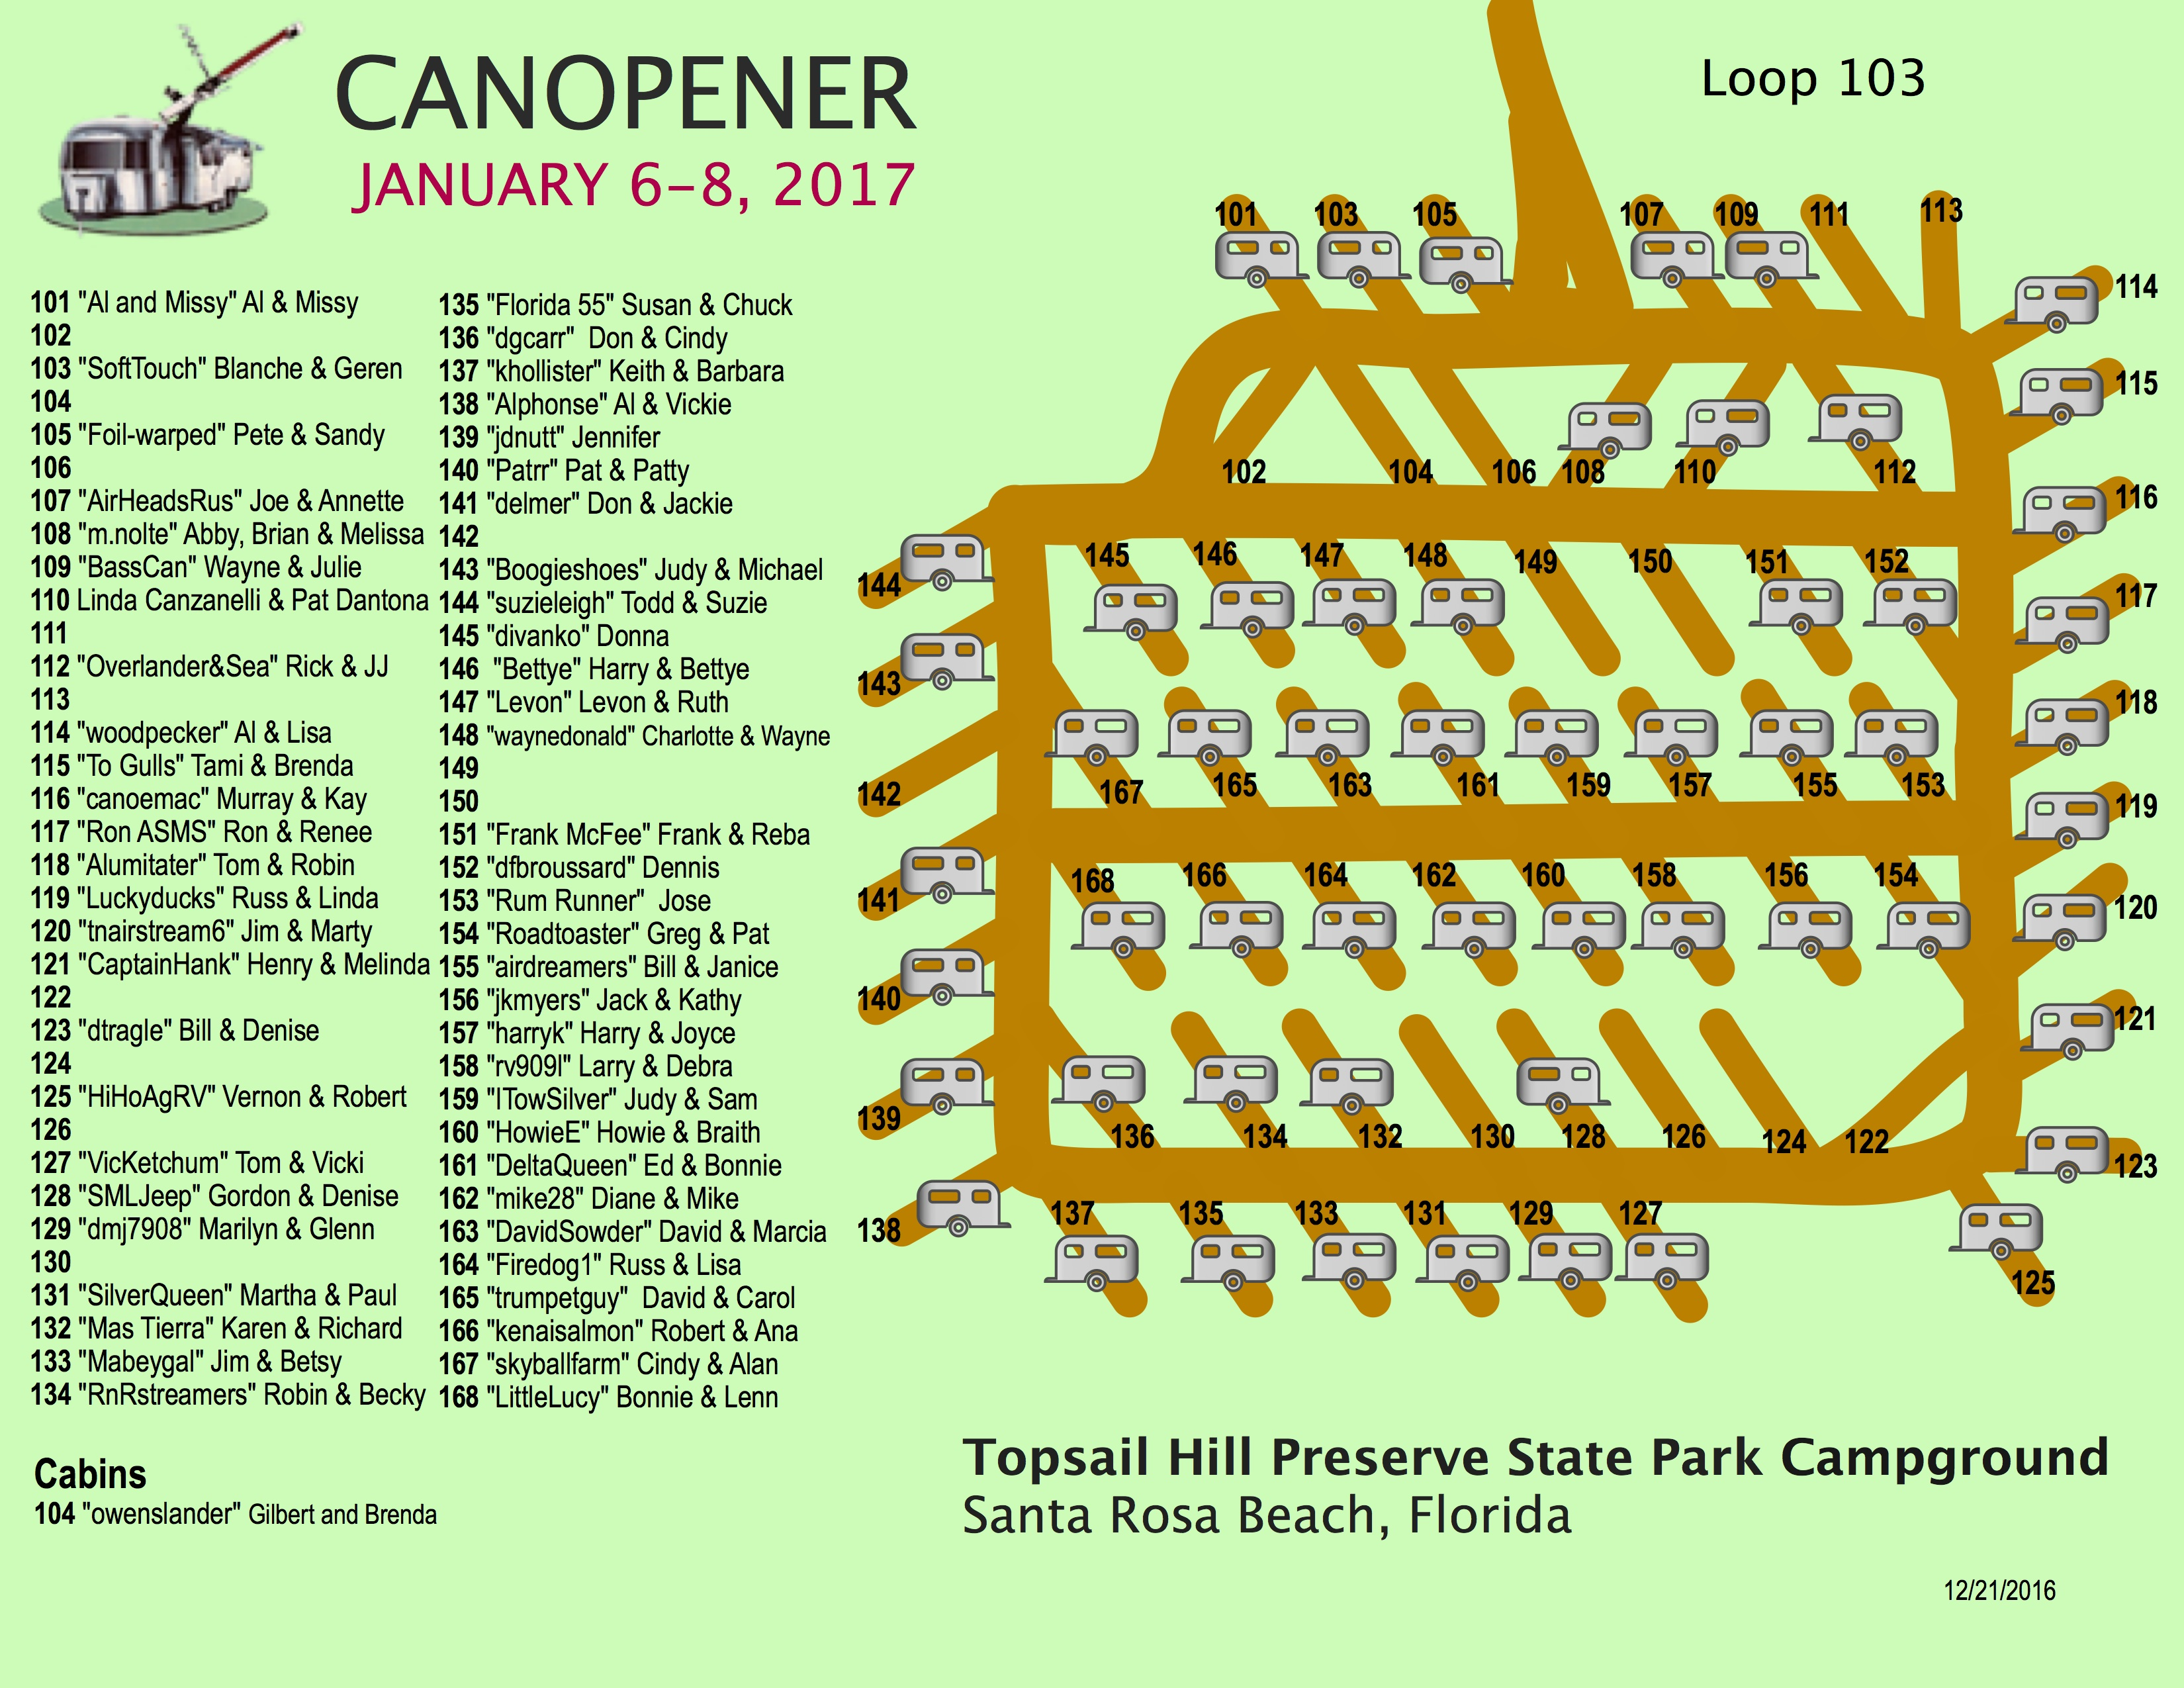 Canopener 2017 Rally Map 103 Loop